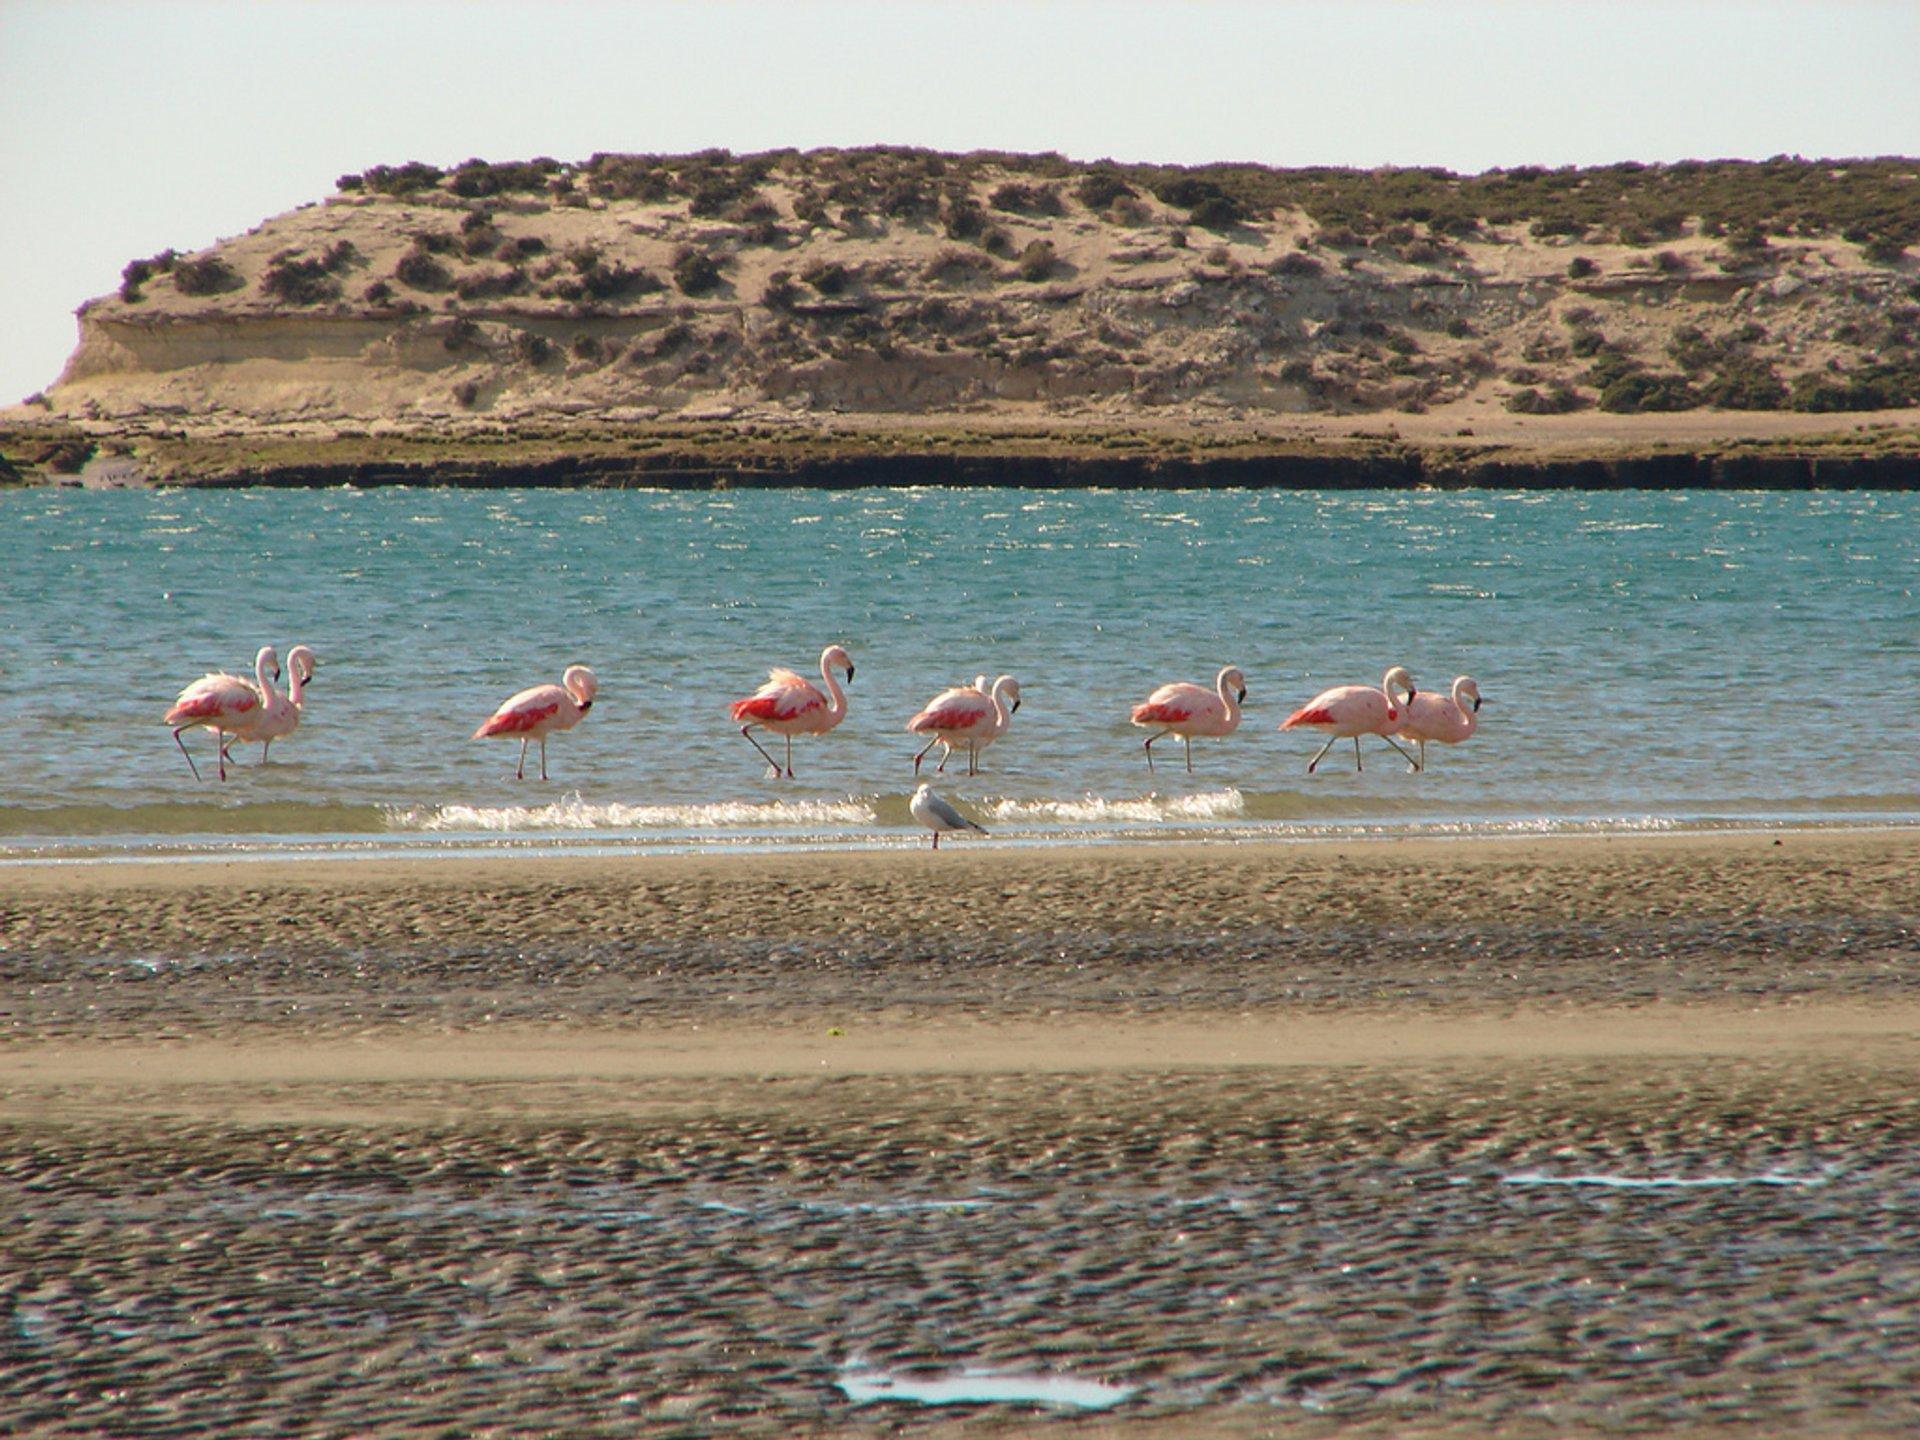 Flamingos in San José Gulf, Península de Valdés, Chubut 2020